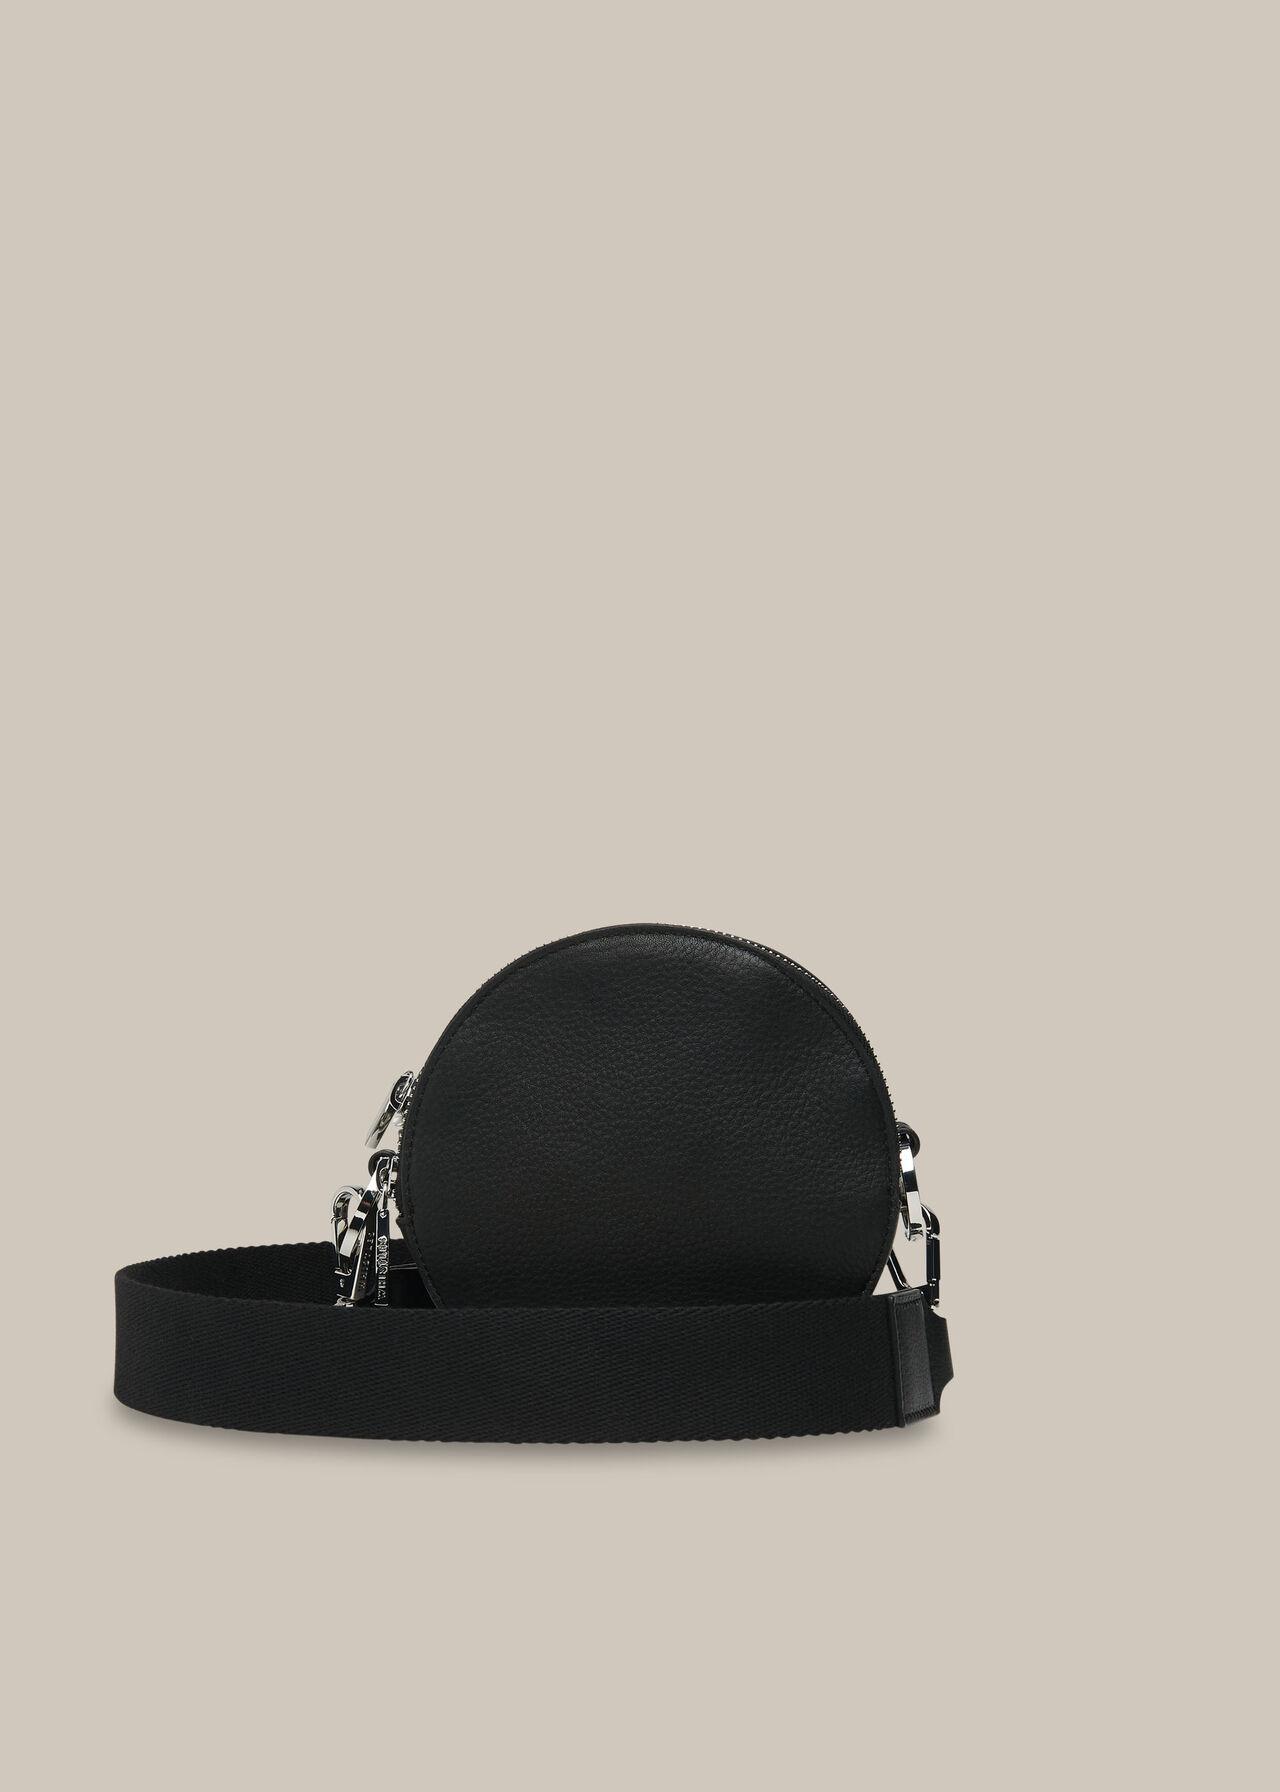 Cole Round Crossbody Bag Black